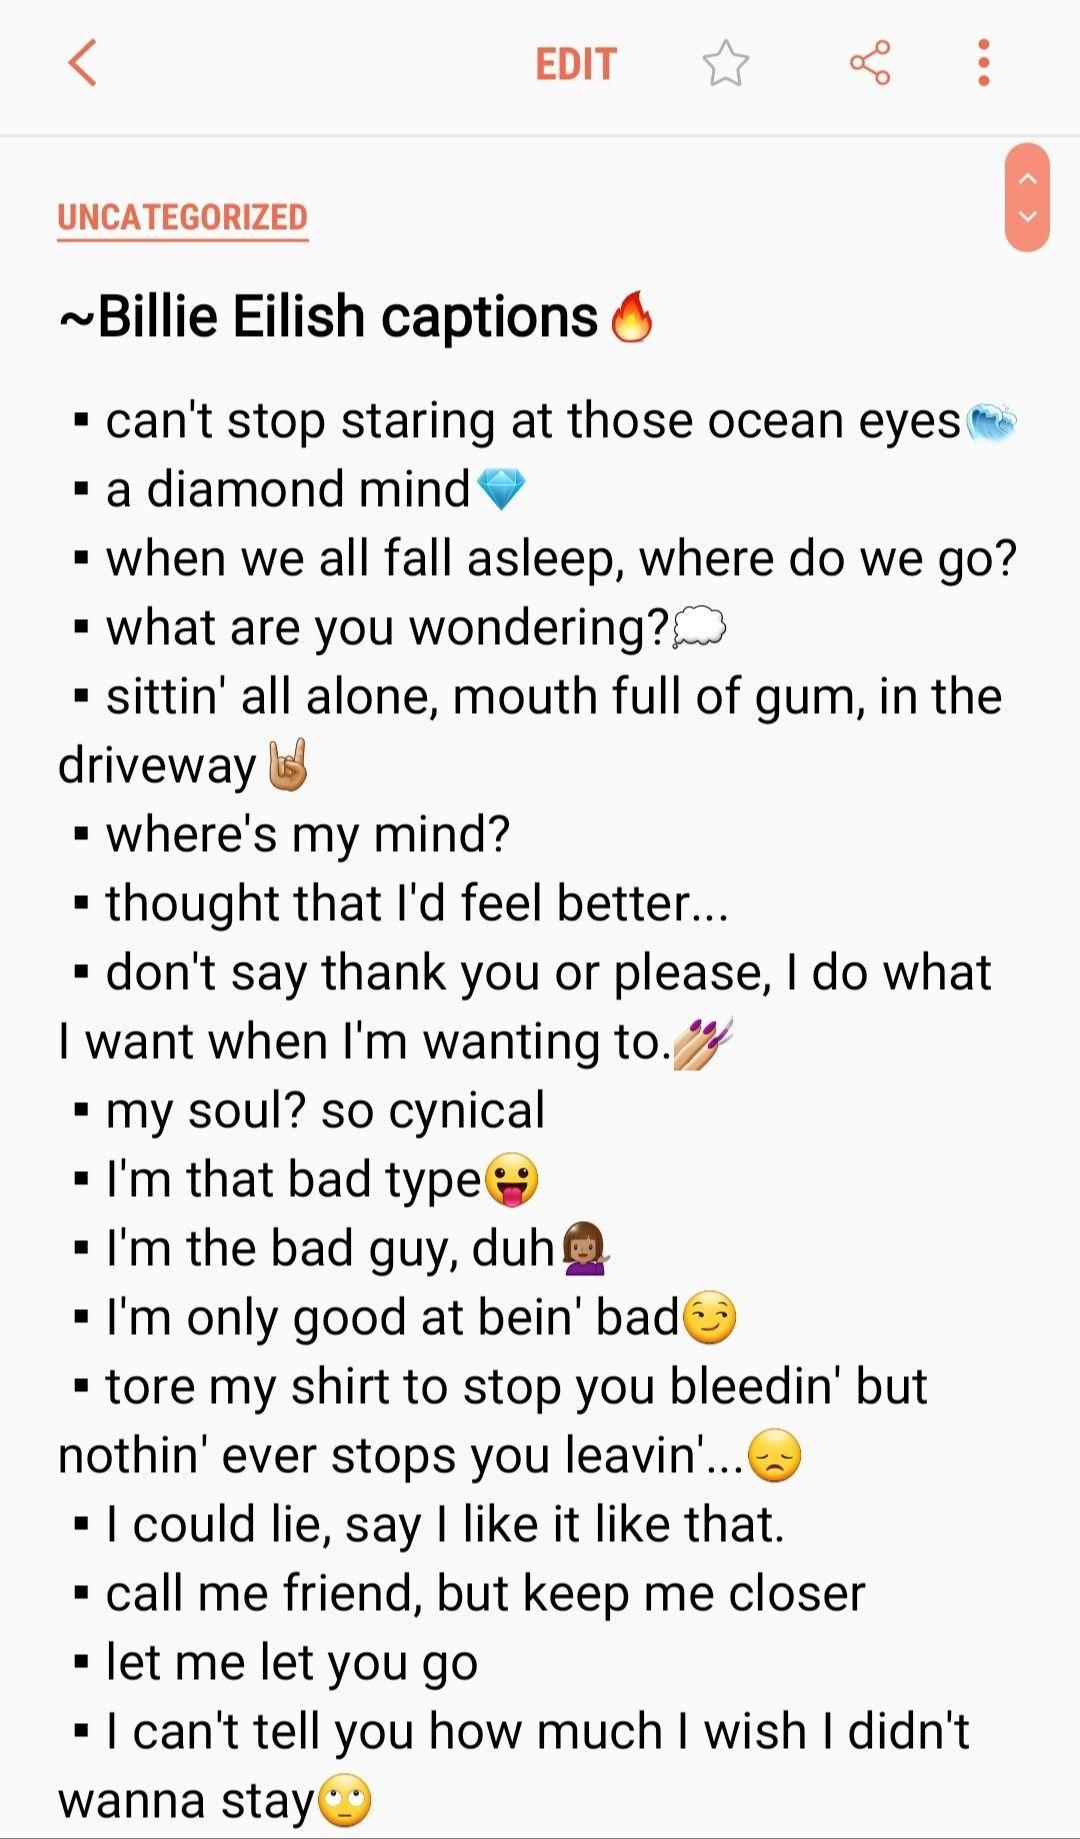 Instagram Captions Lyrics In 2020 Instagram Quotes Captions Instagram Captions For Selfies Instagram Captions For Friends